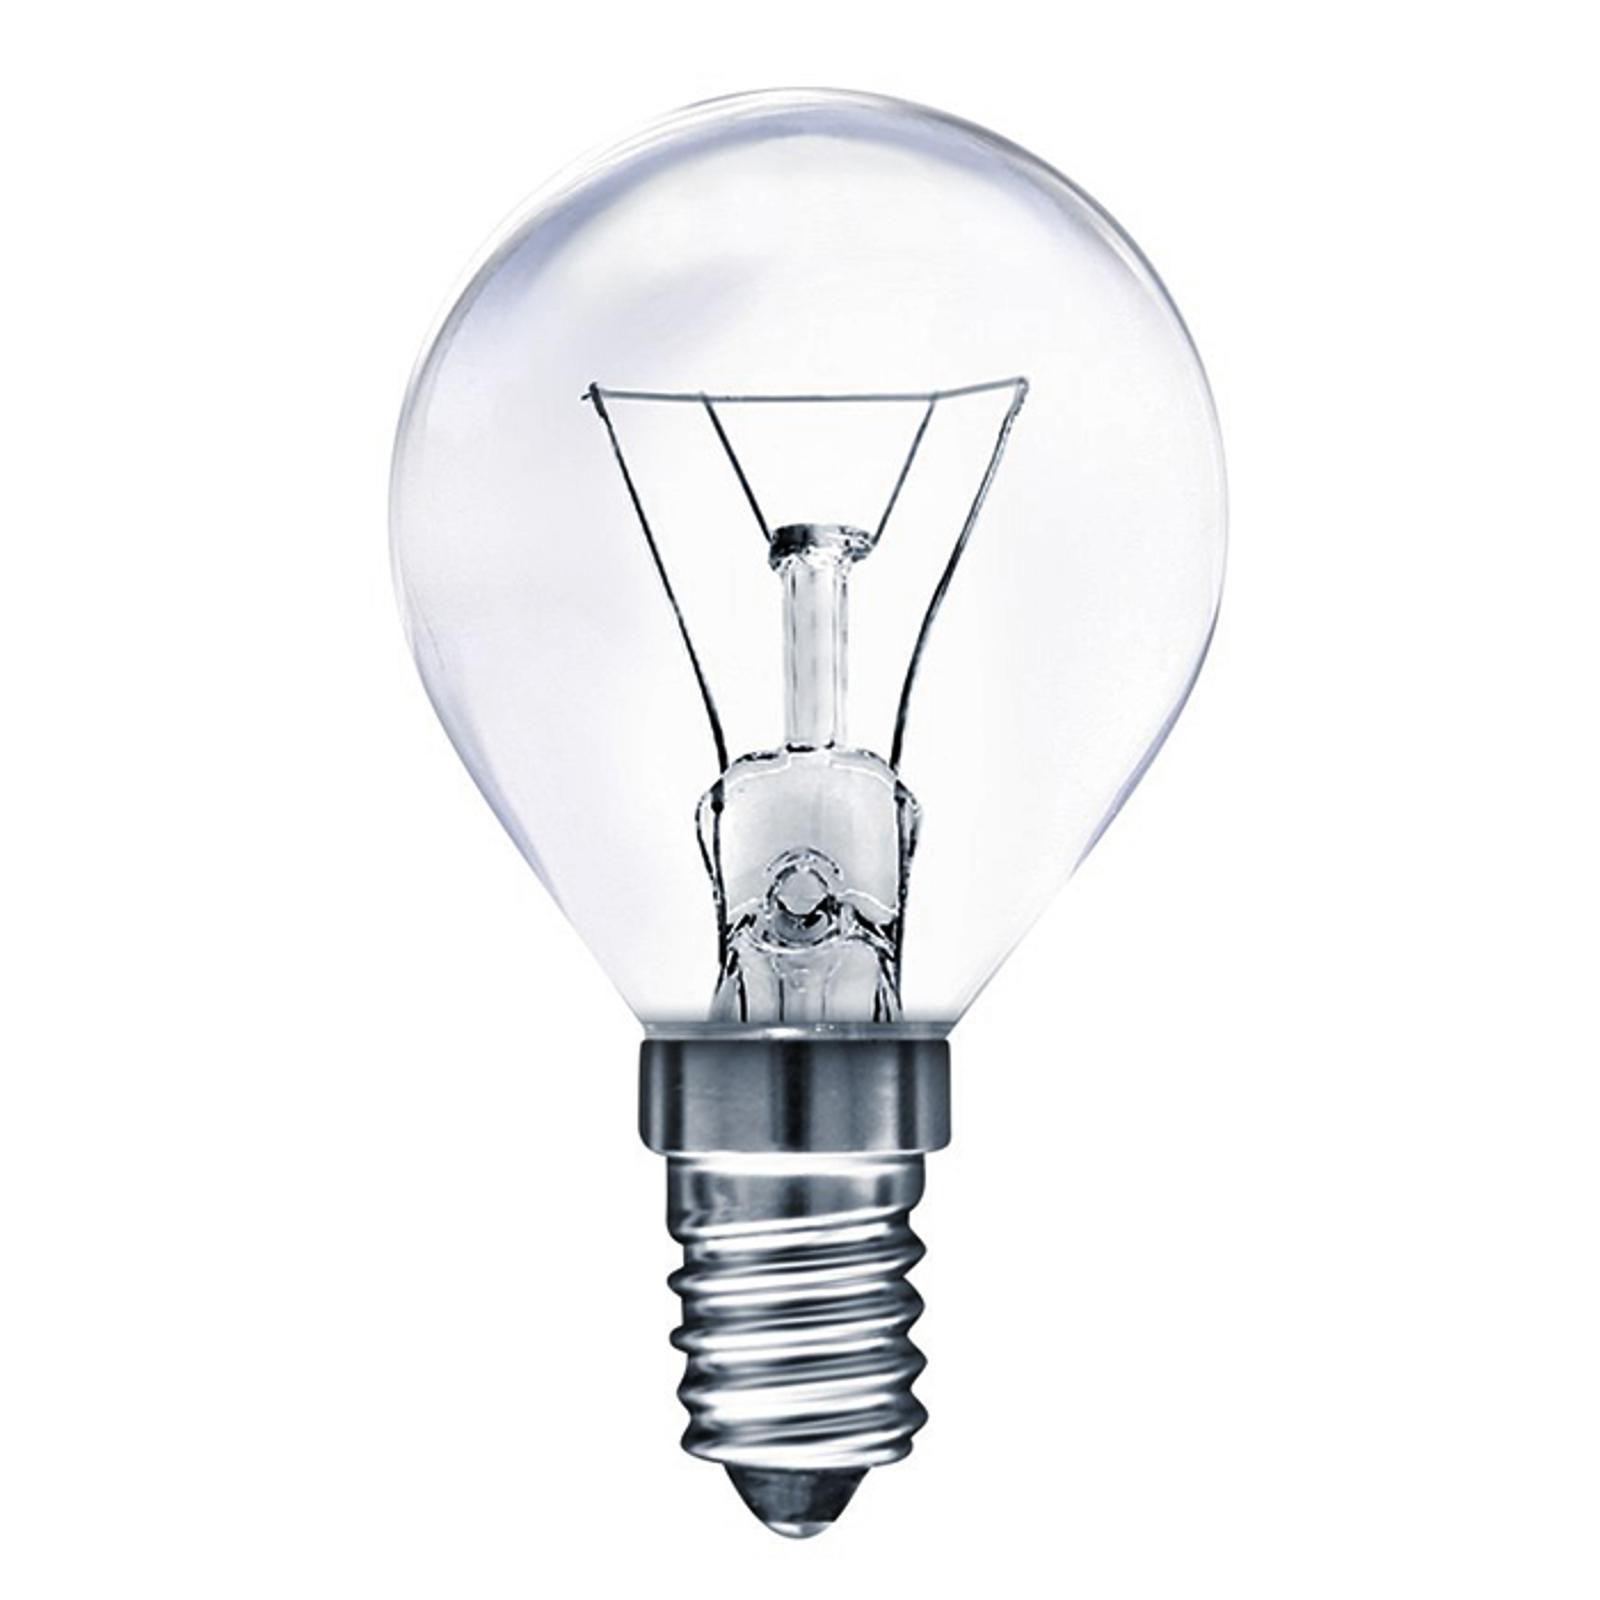 E14 25W (25W) oven golf ball bulb, warm-white_6520253_1